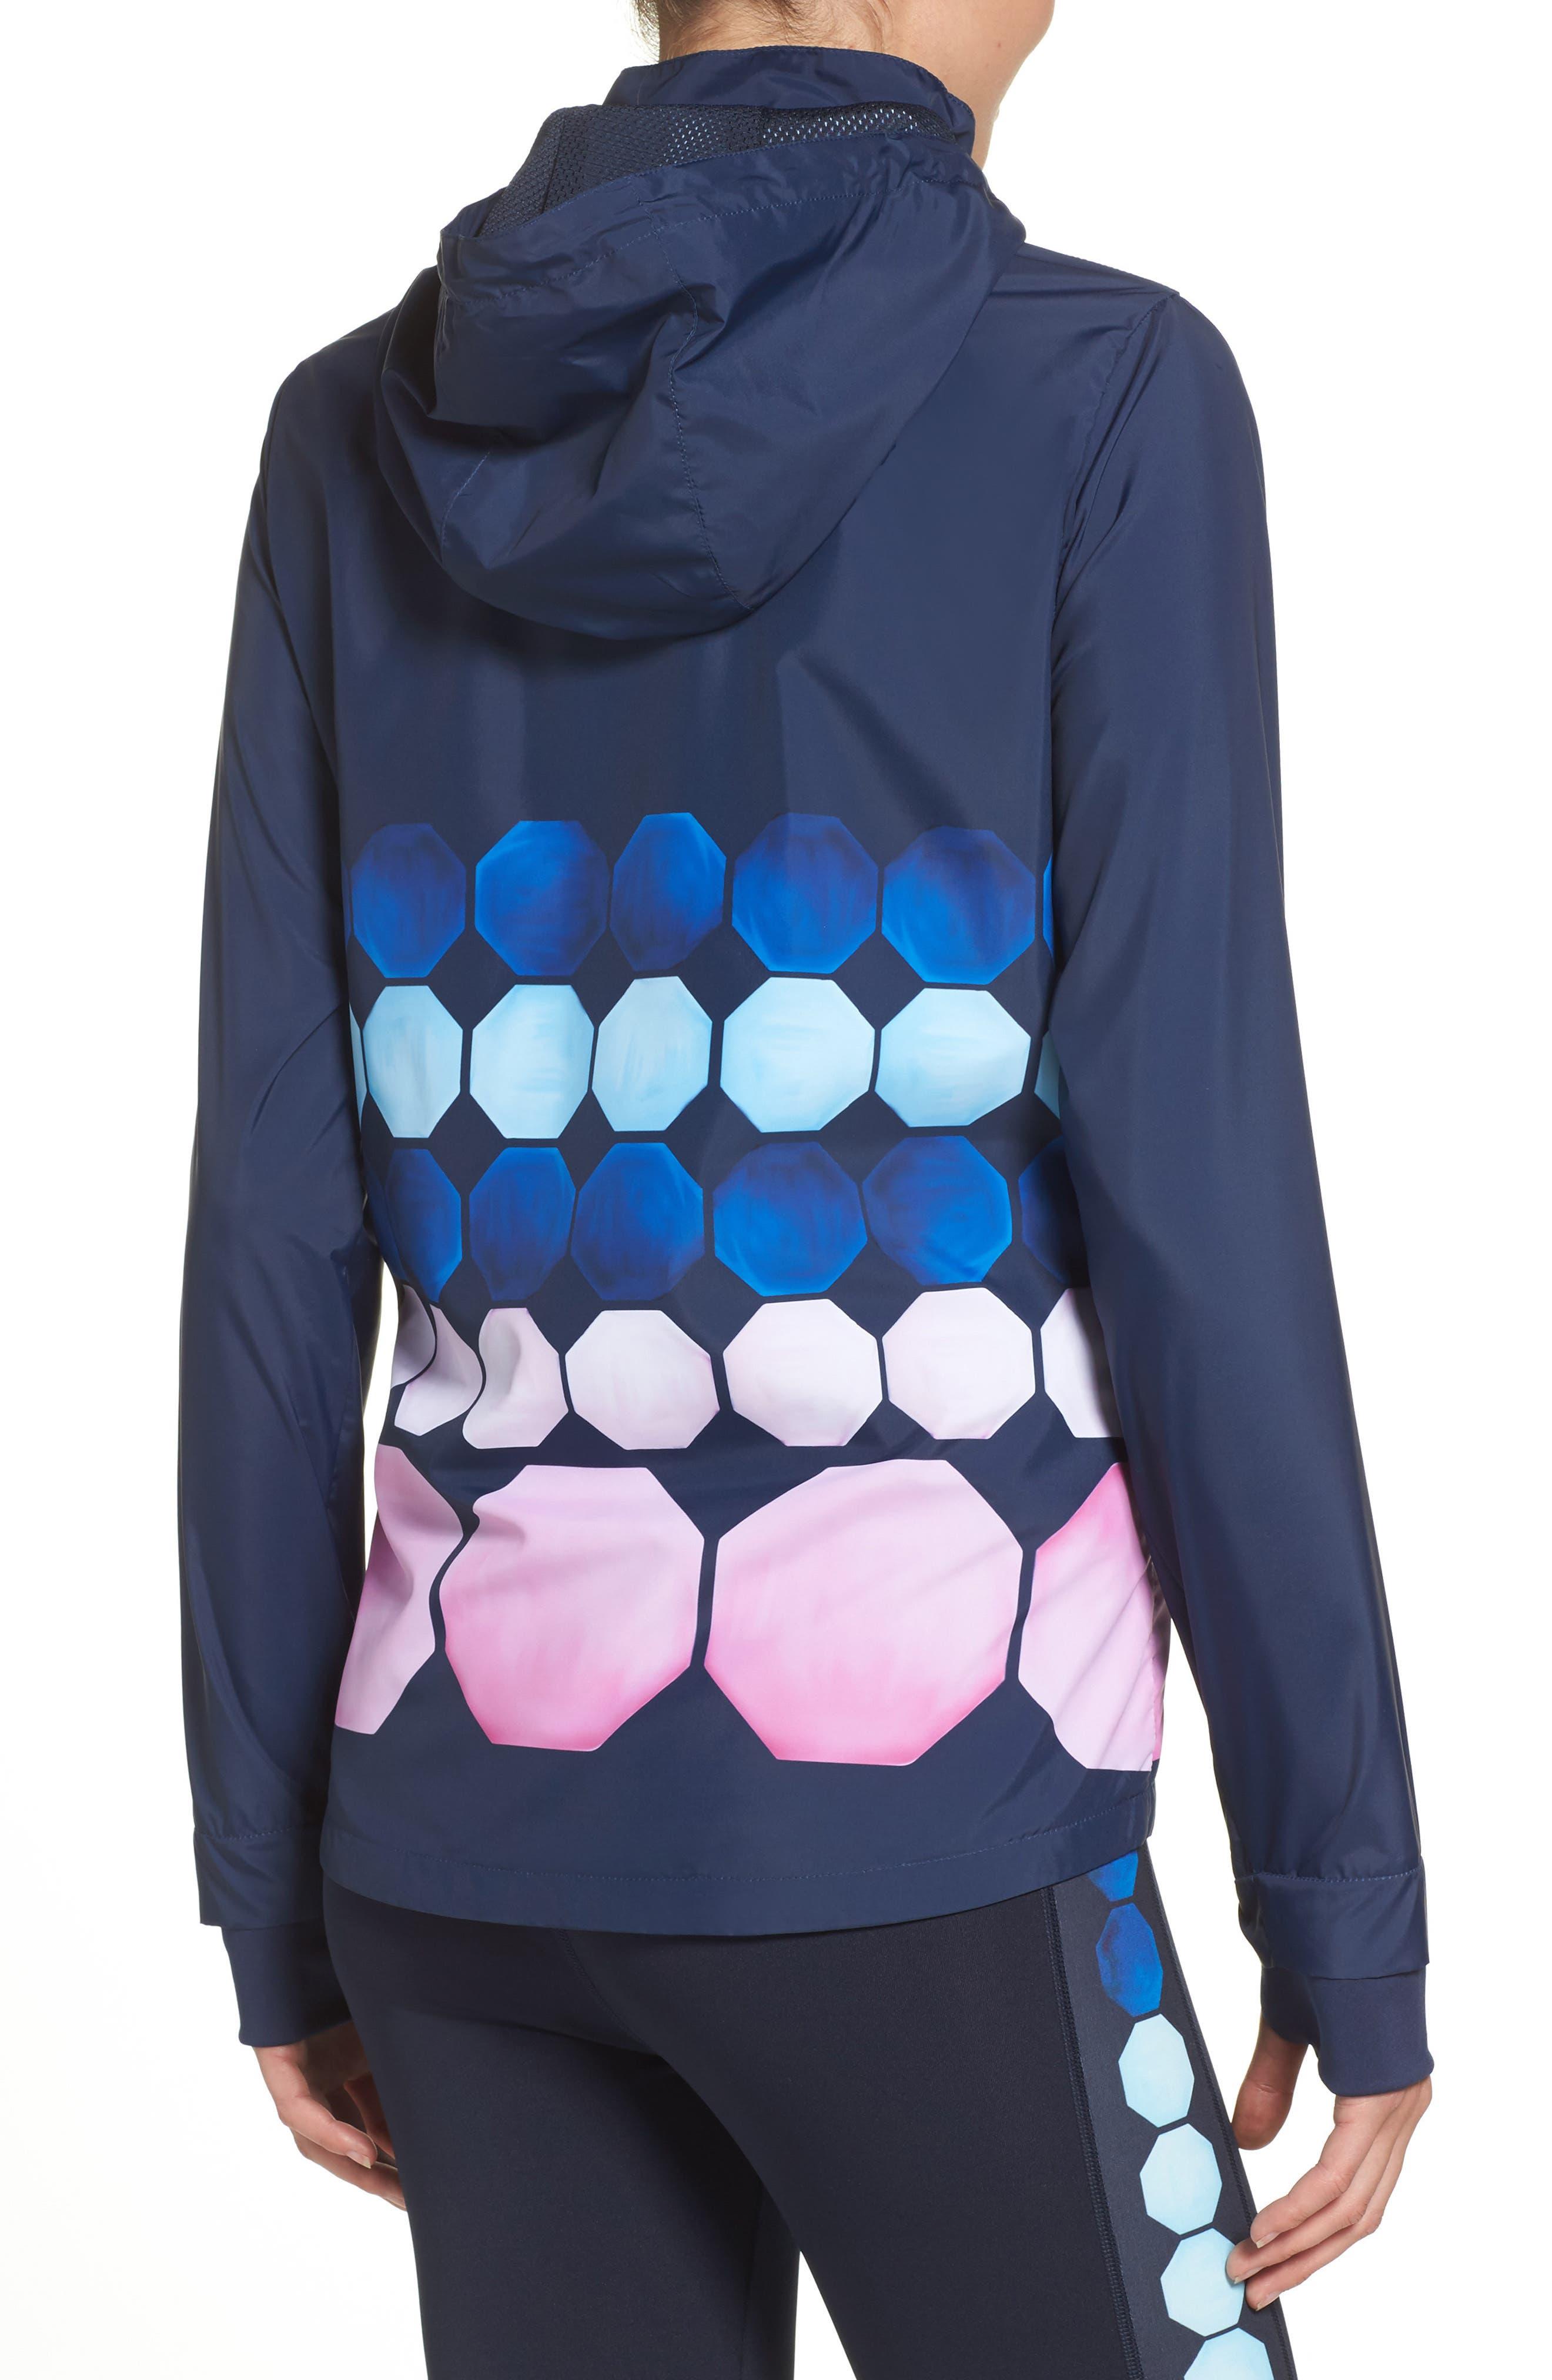 Marina Mosaic Hooded Jacket,                             Alternate thumbnail 2, color,                             410